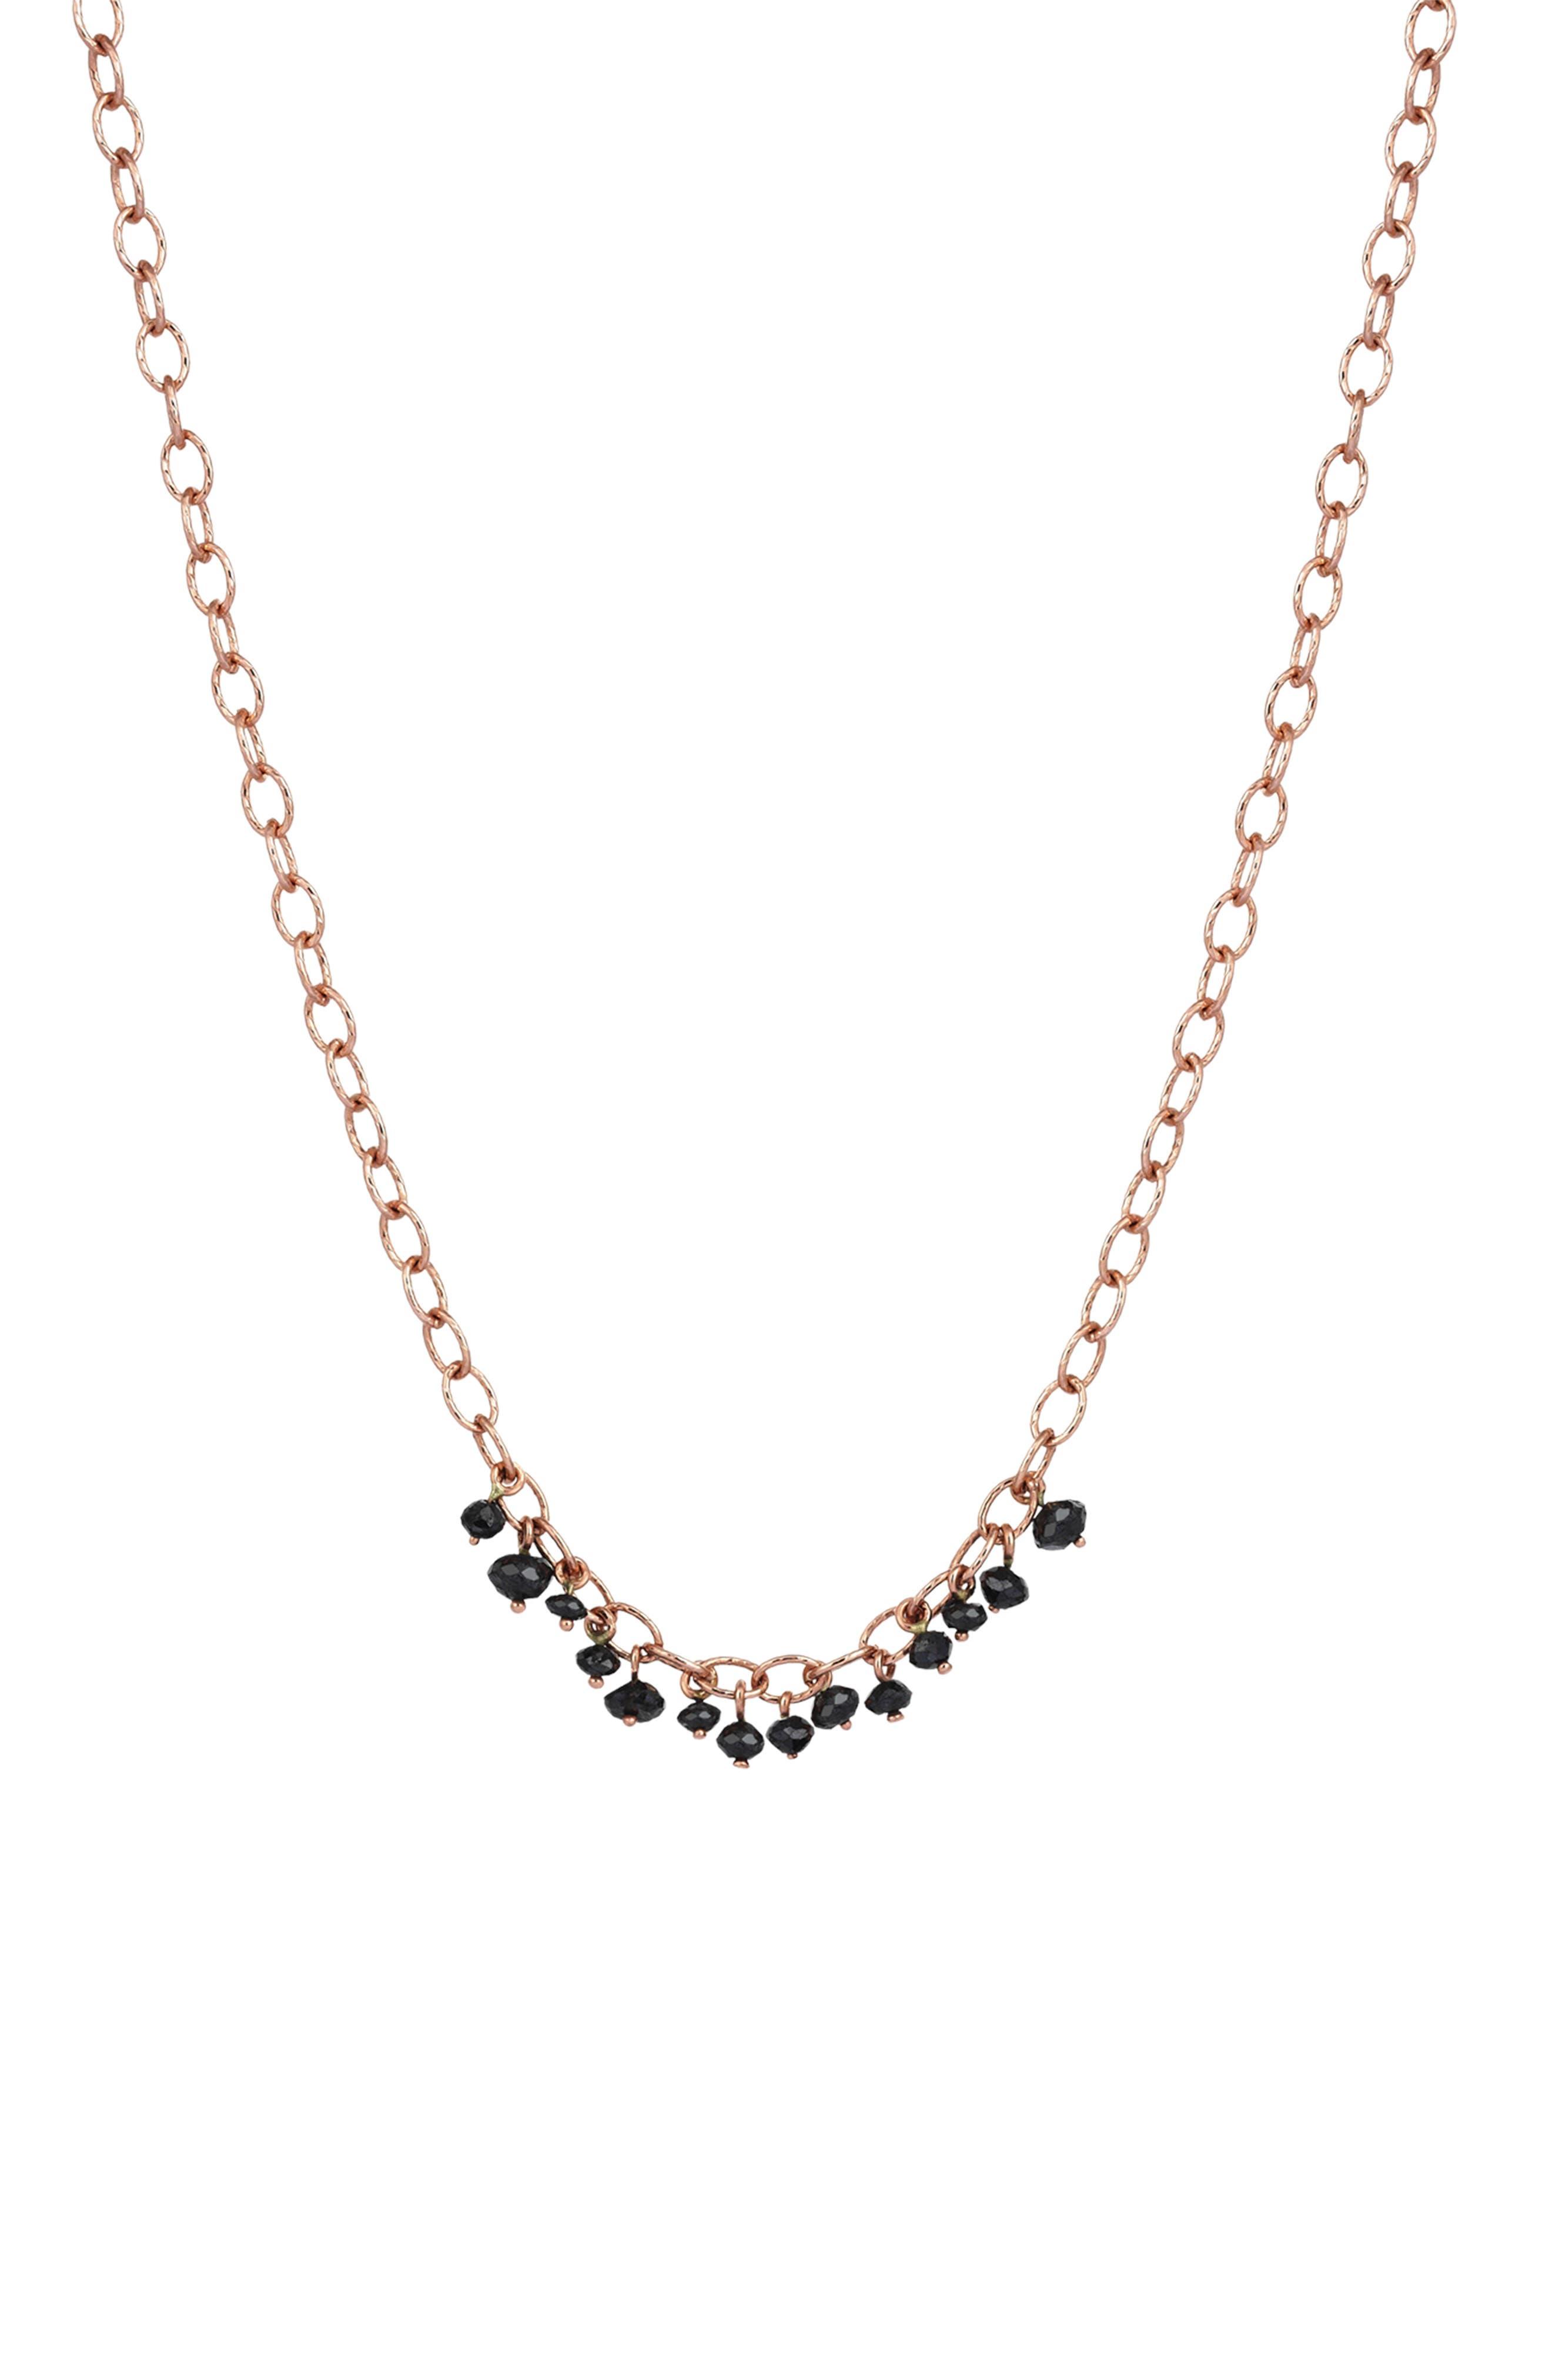 Main Image - Kismet by Milka Black Diamond Pendant Necklace